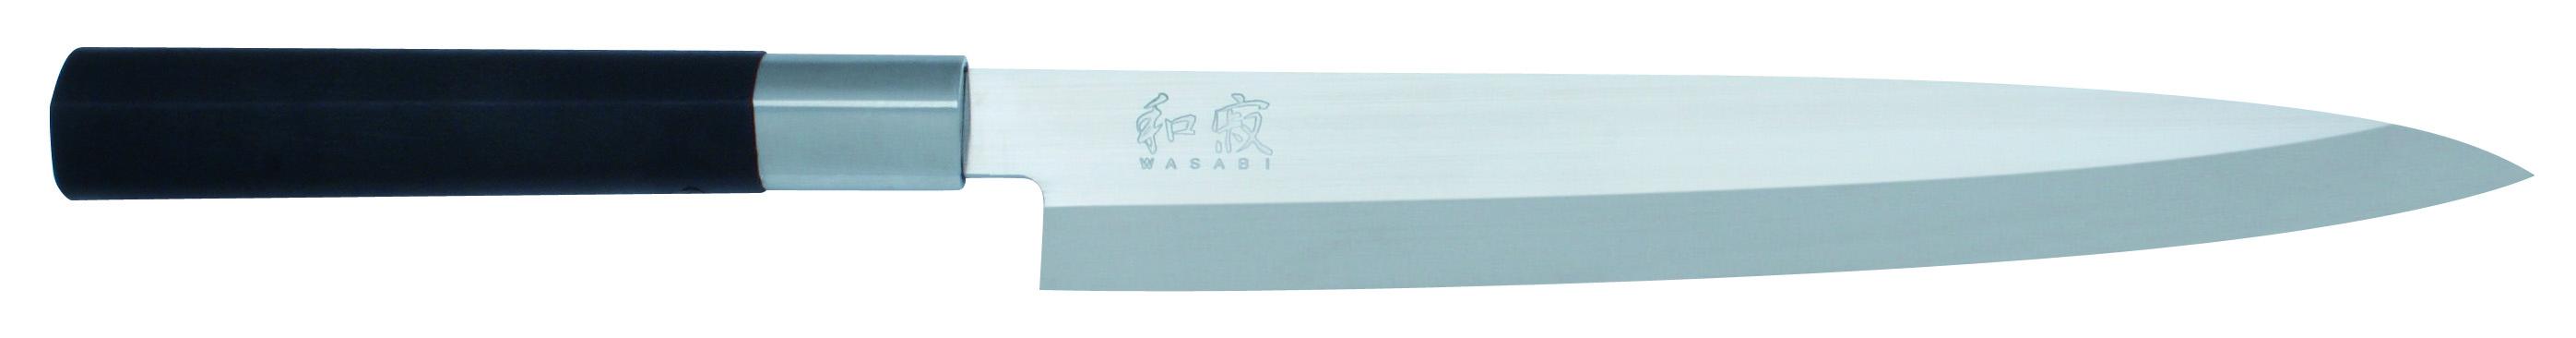 KAI Wasabi Black Yanagibakniv 21 cm